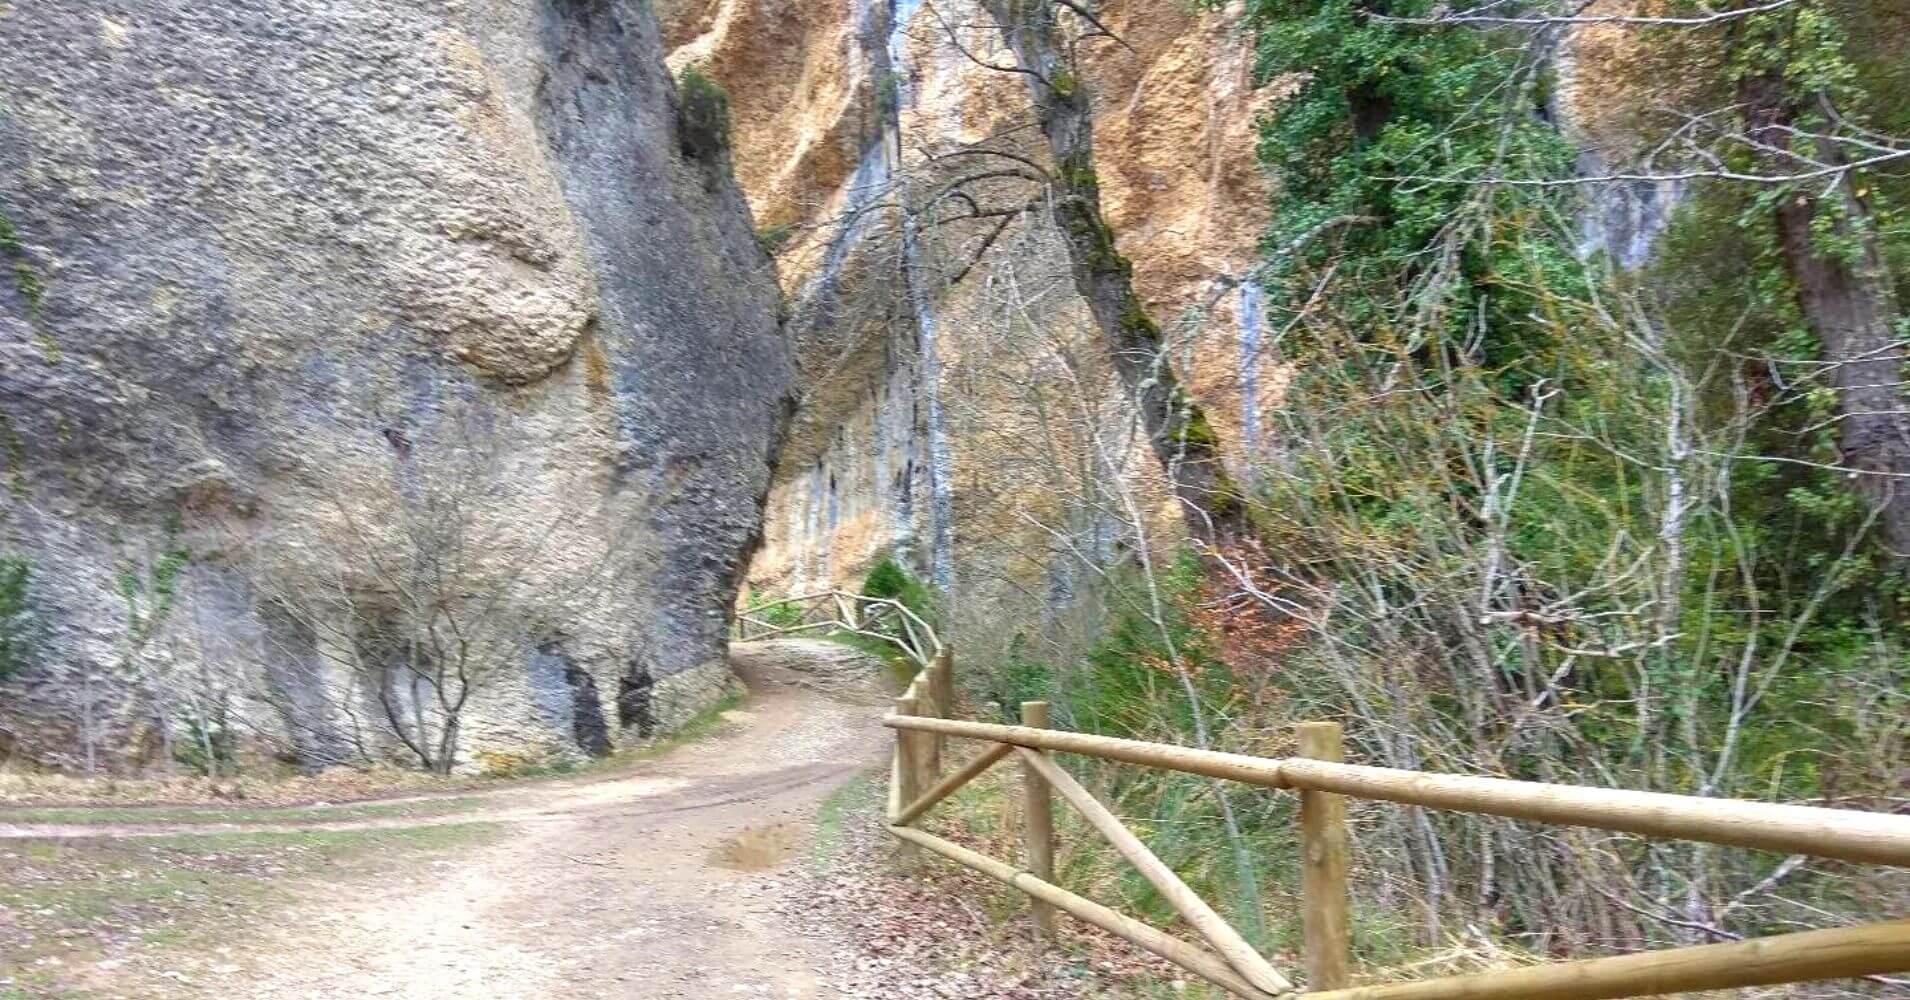 Parque Natural Valderejo. Álava, País Vasco. Euskadi.